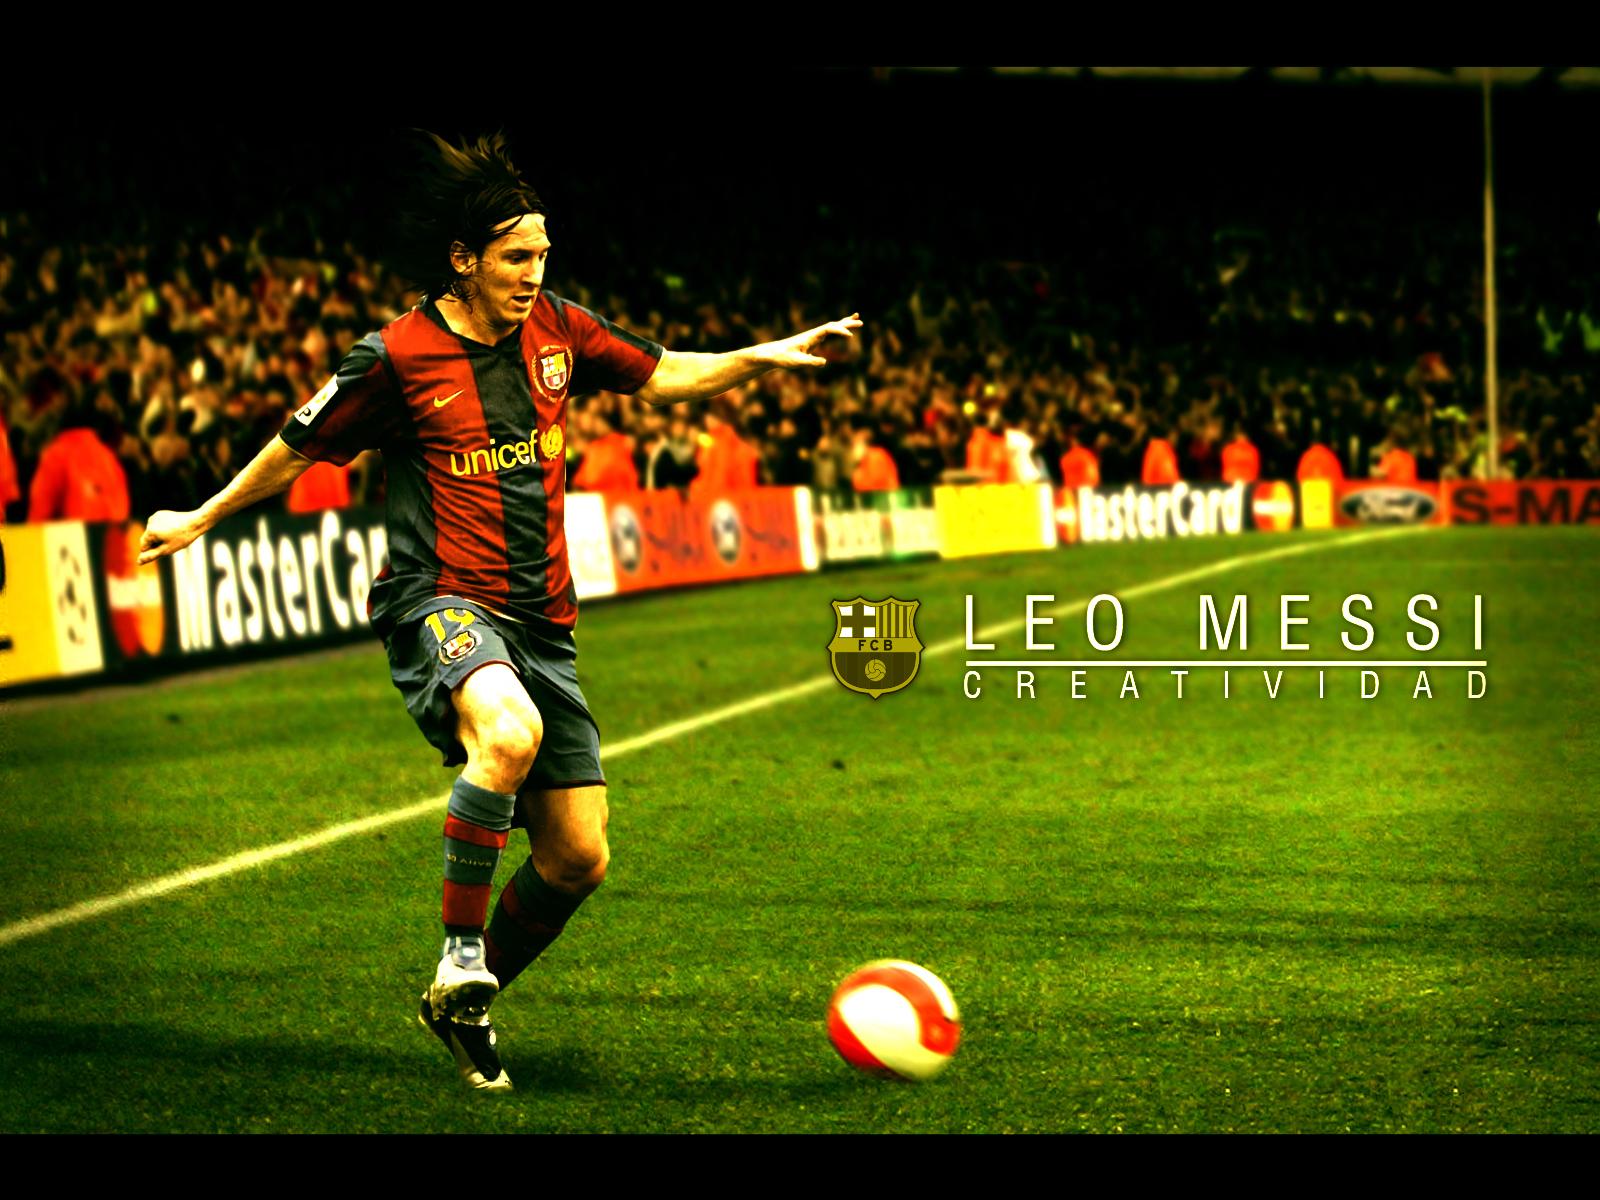 http://1.bp.blogspot.com/-GJO_UWpicts/TbA-u1fxKpI/AAAAAAAAAdA/uPT1vVLmYR4/s1600/Lionel_Messi_10_by_MA88.jpg